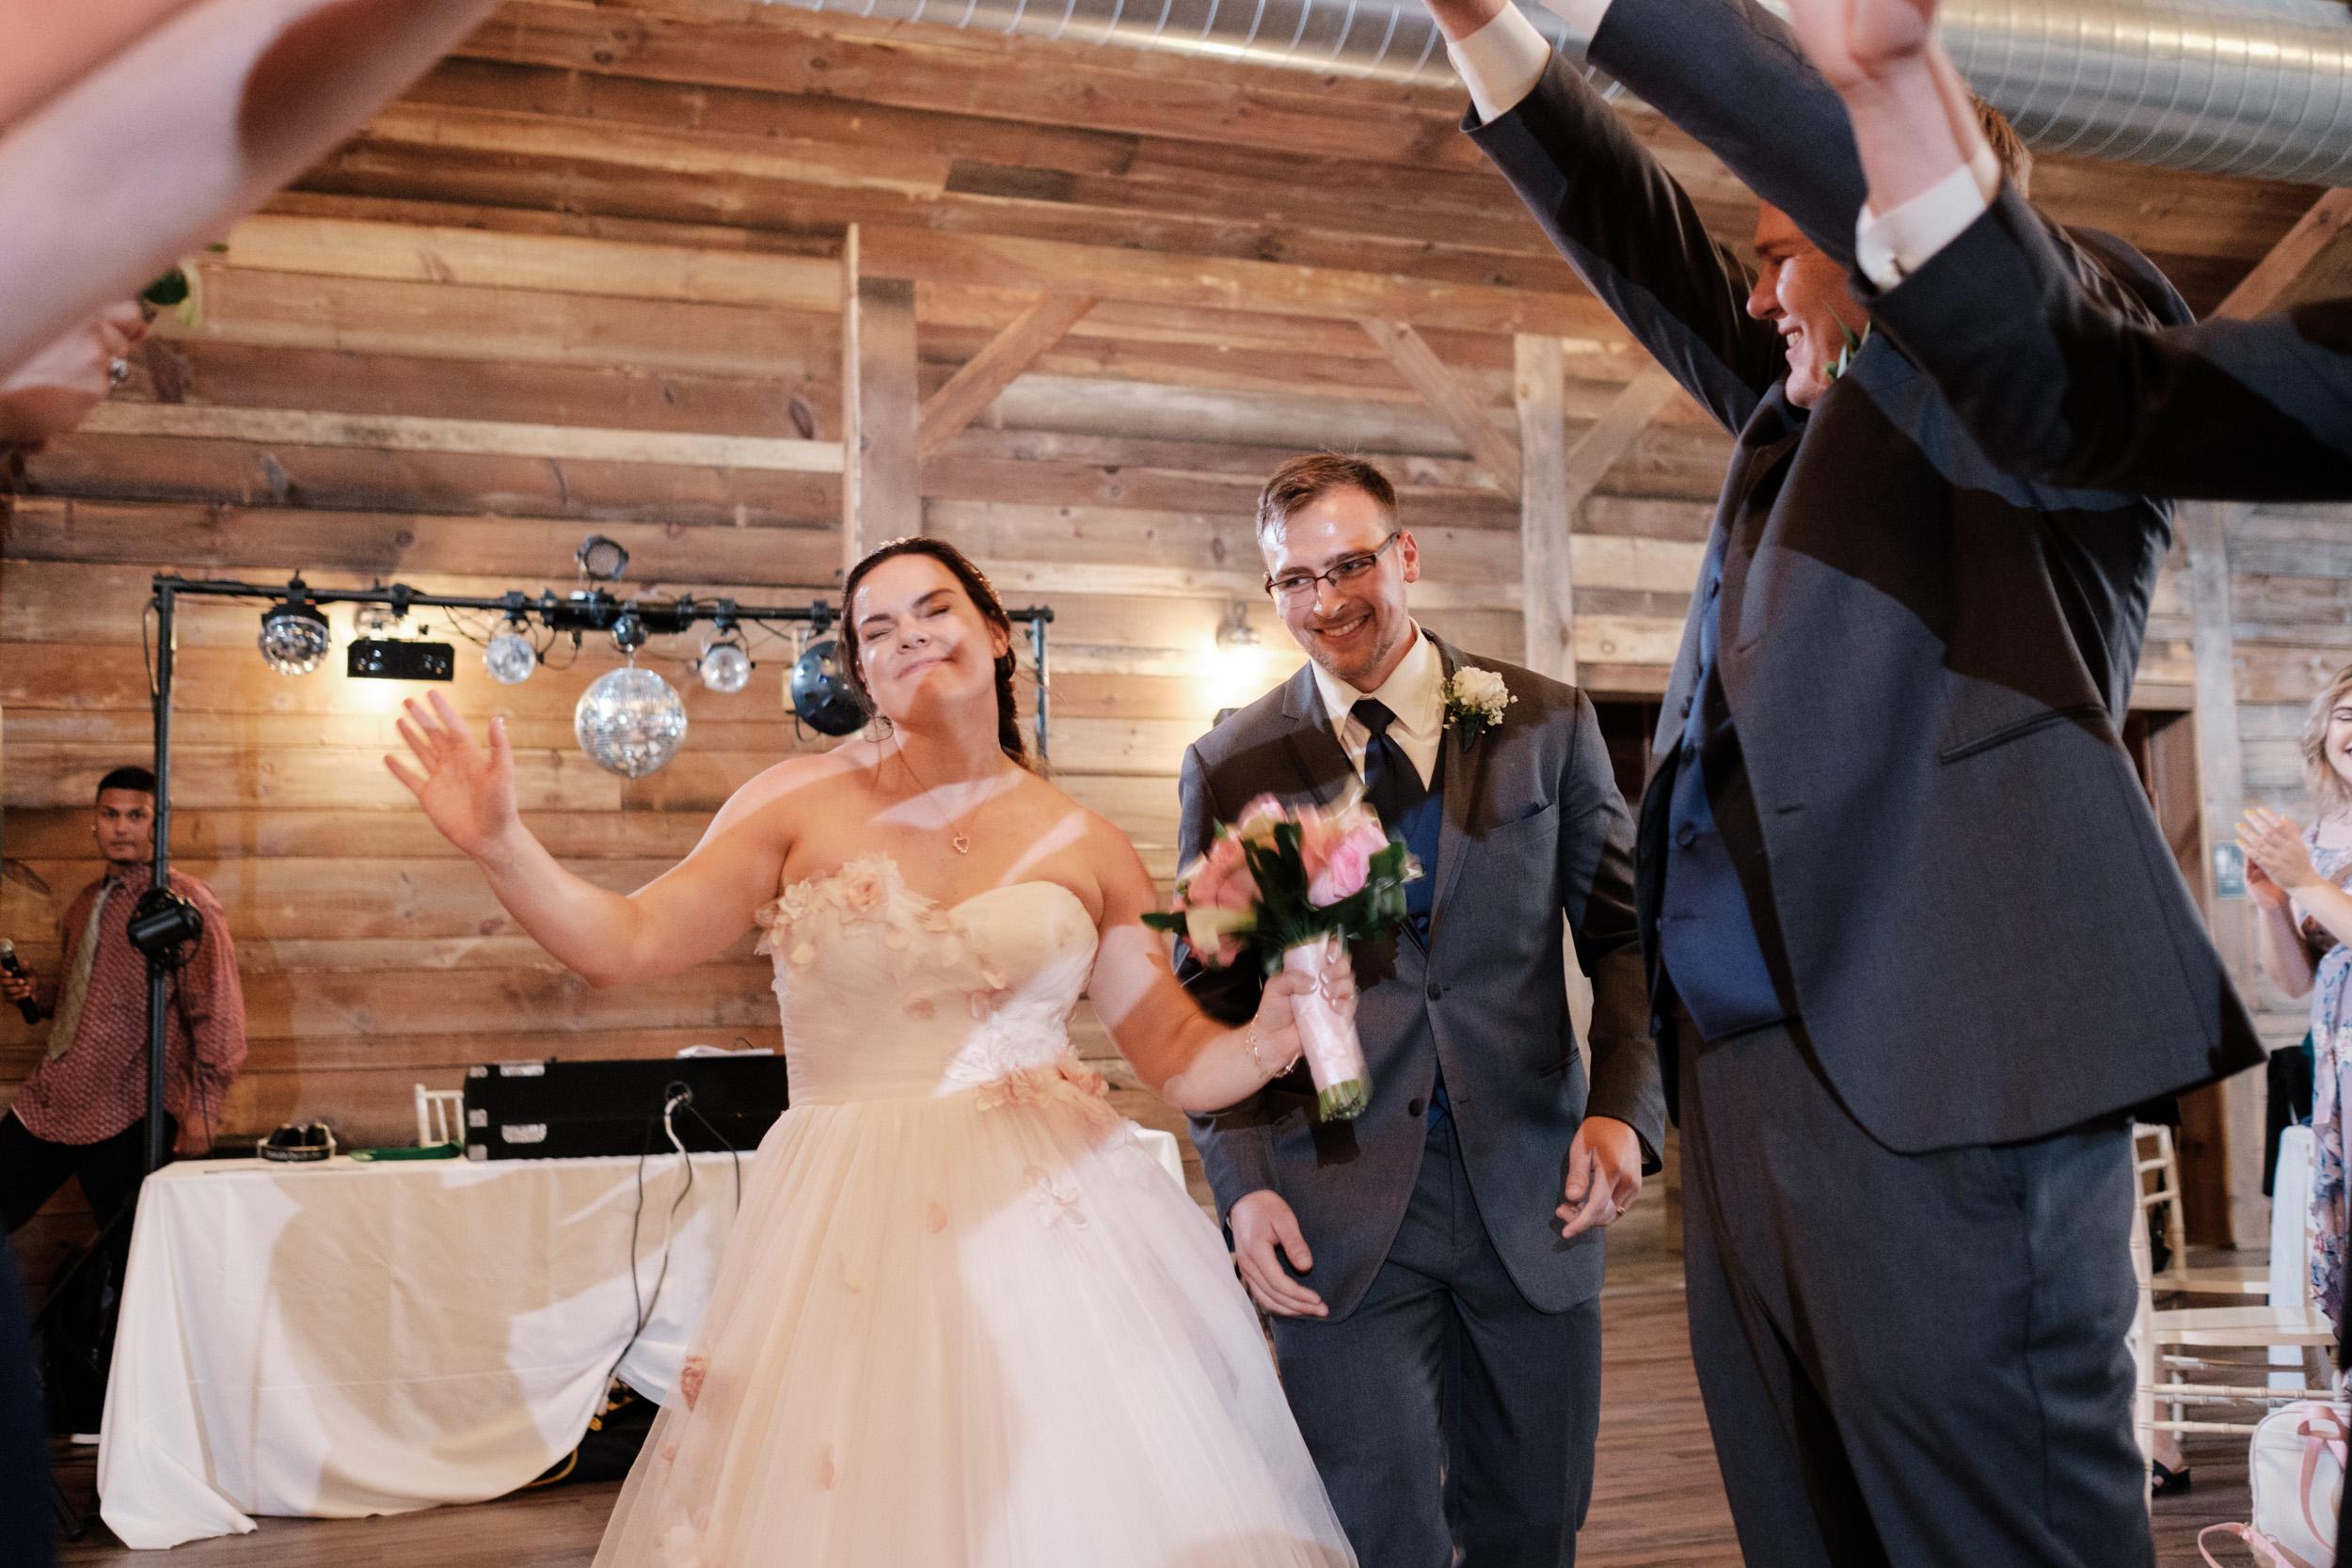 19-06-22-Ryan-Katie-The-Fields-Reserve-Wedding-54.jpg